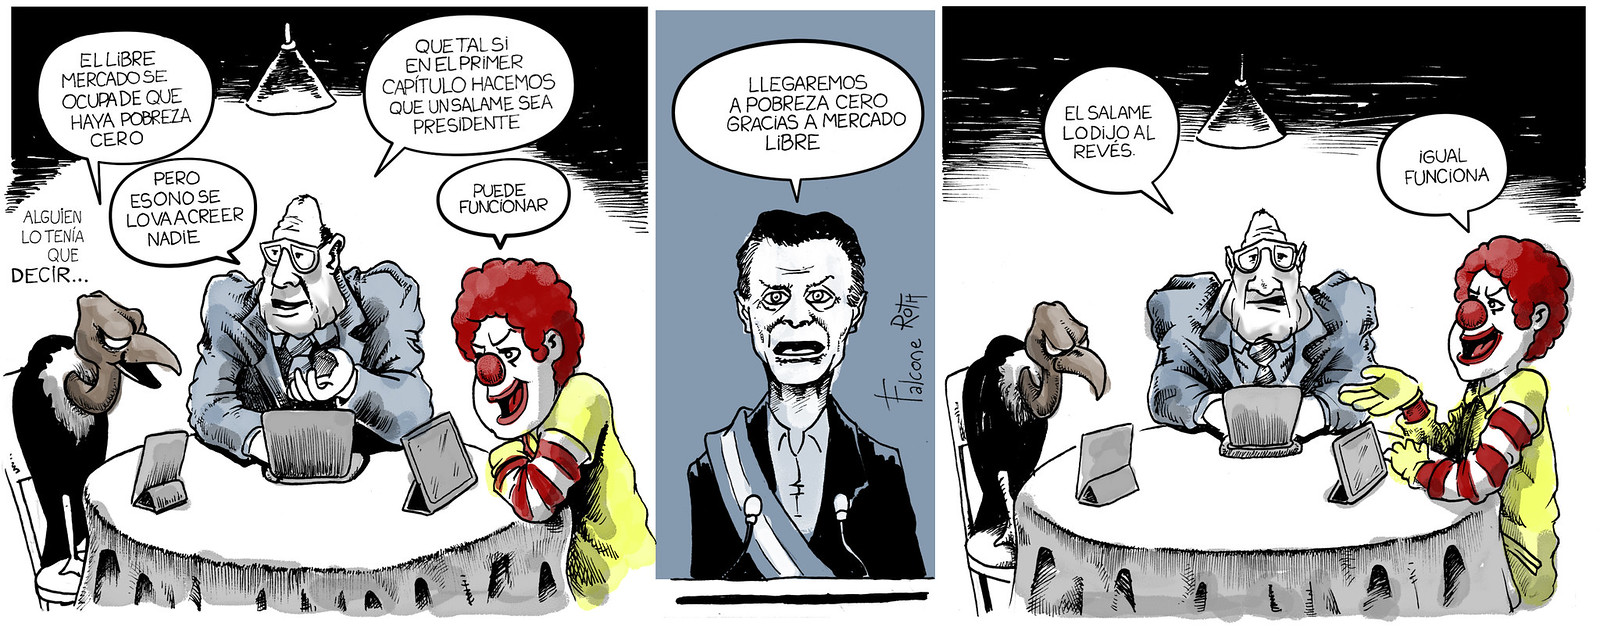 Mauricio Macri en Mercado Libre